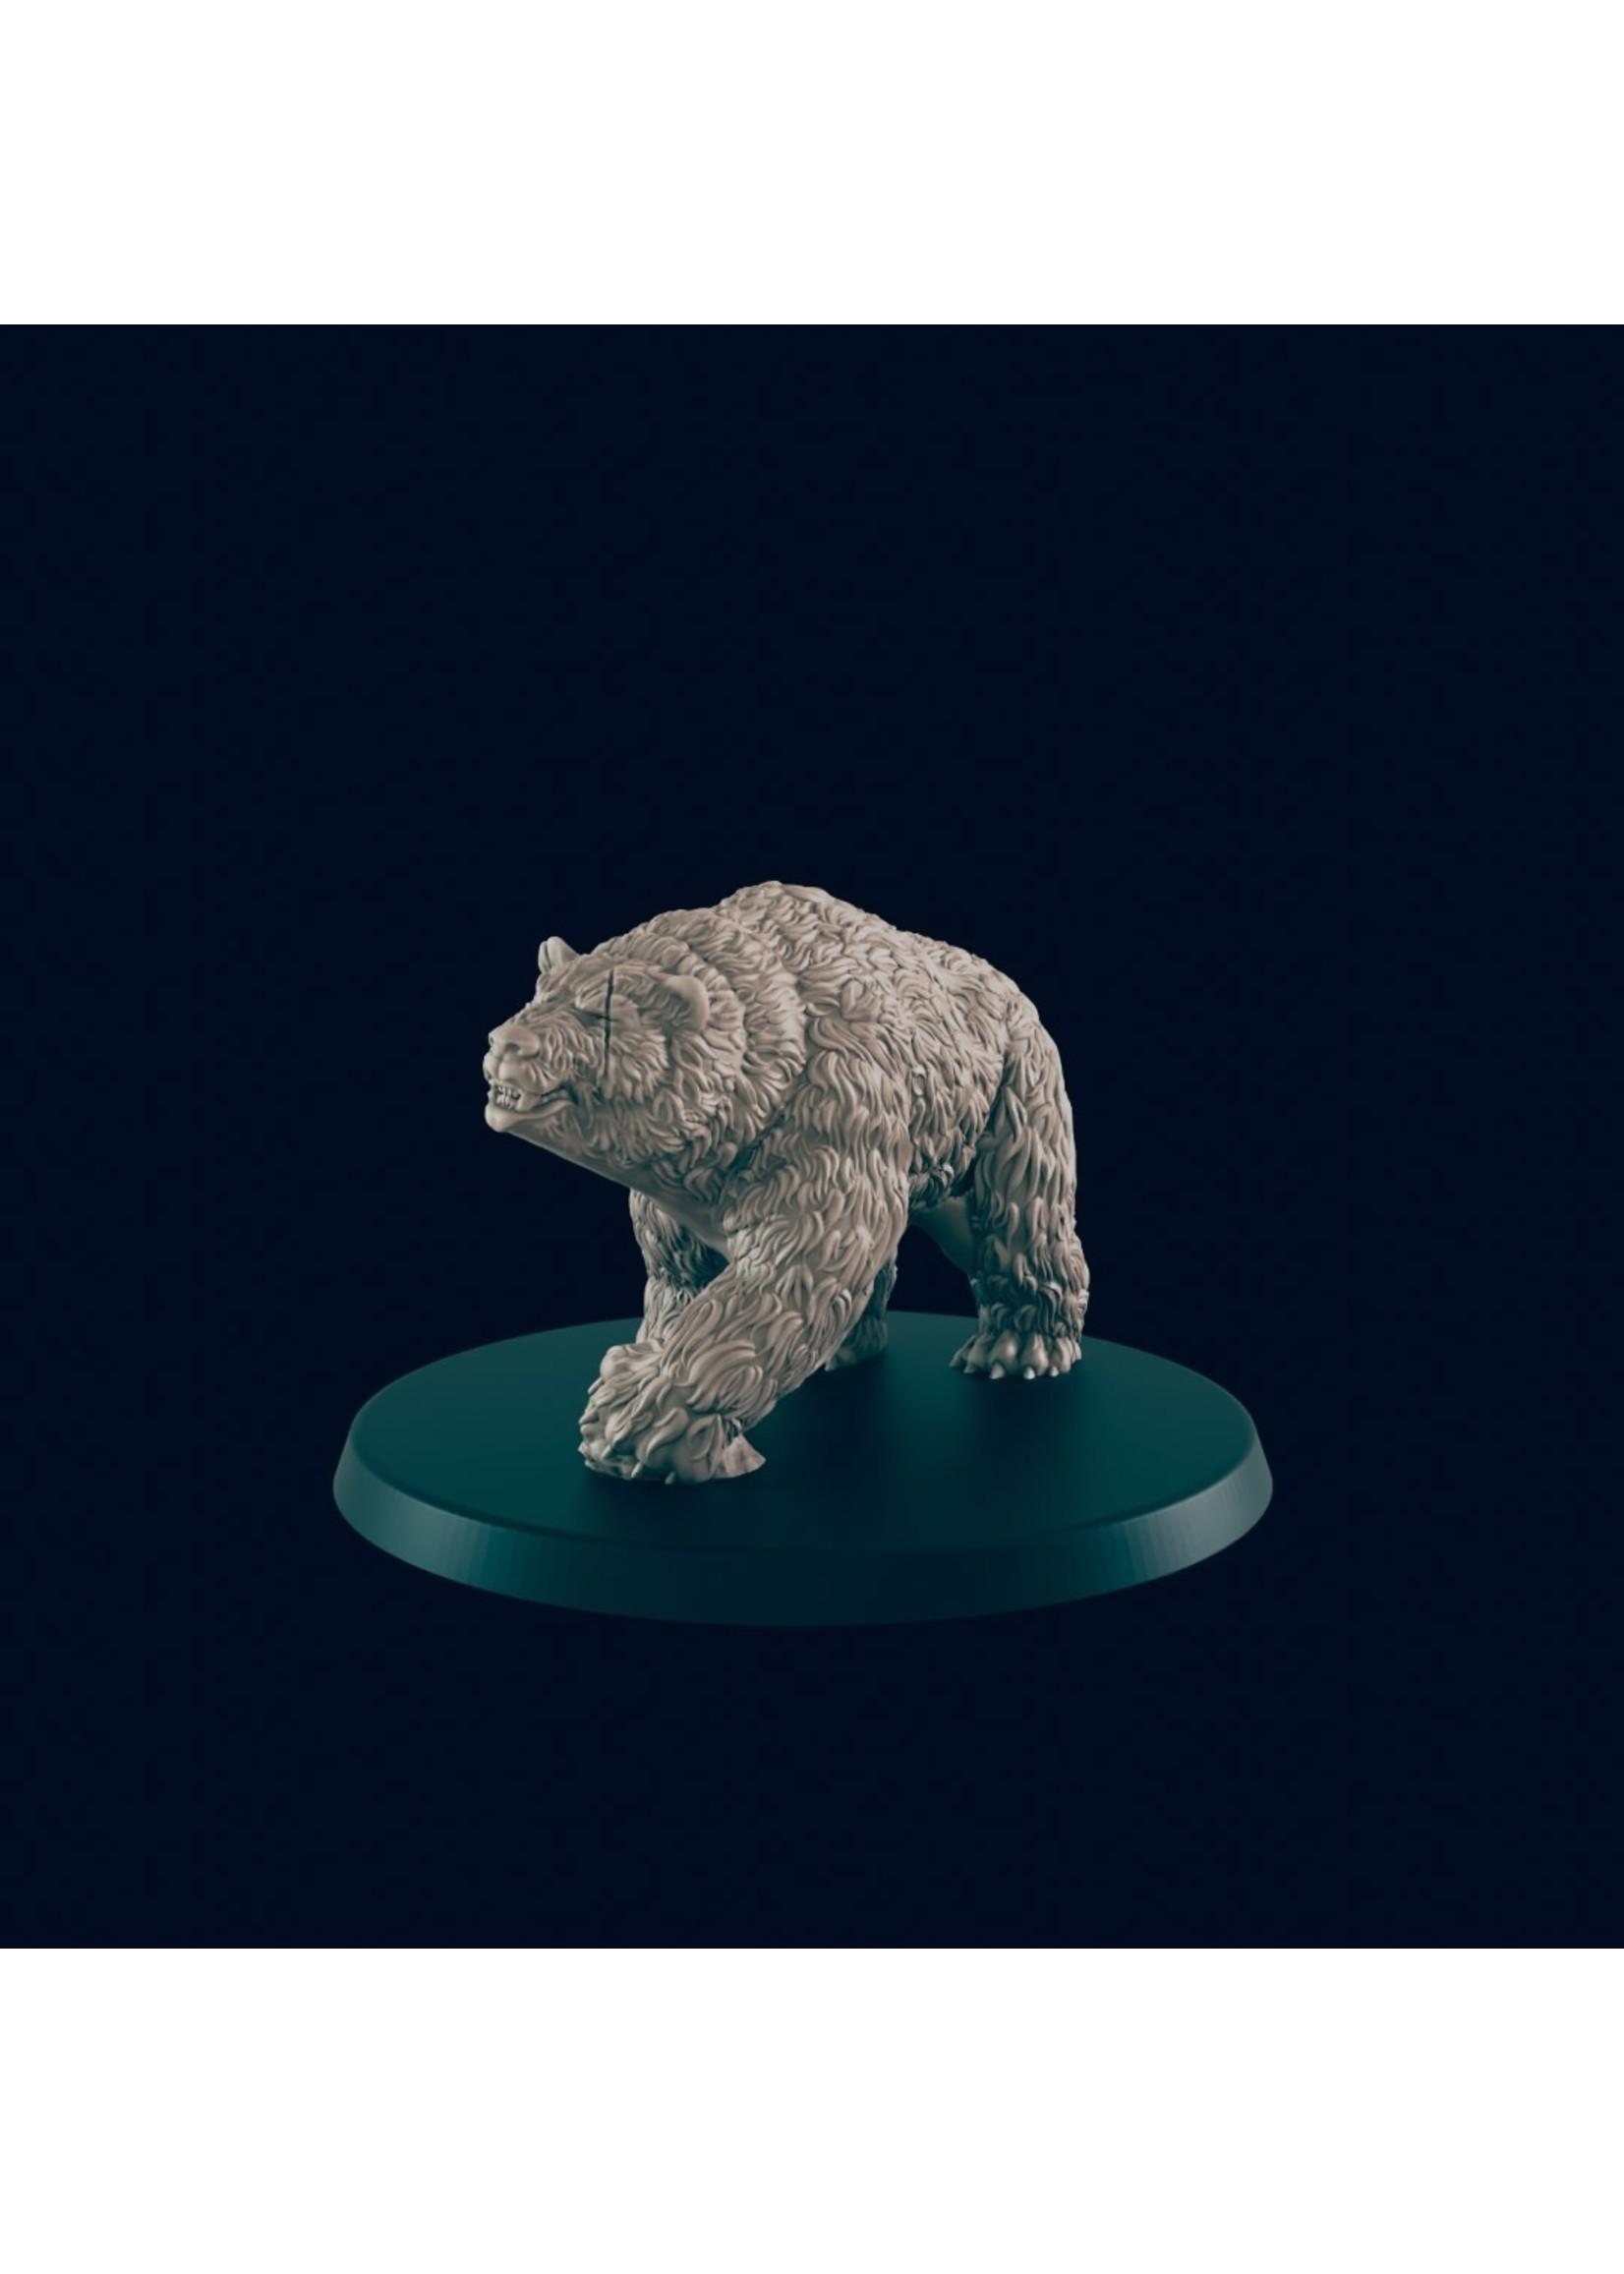 3D Printed Miniature - Bear - Dungeons & Dragons - Beasts and Baddies KS